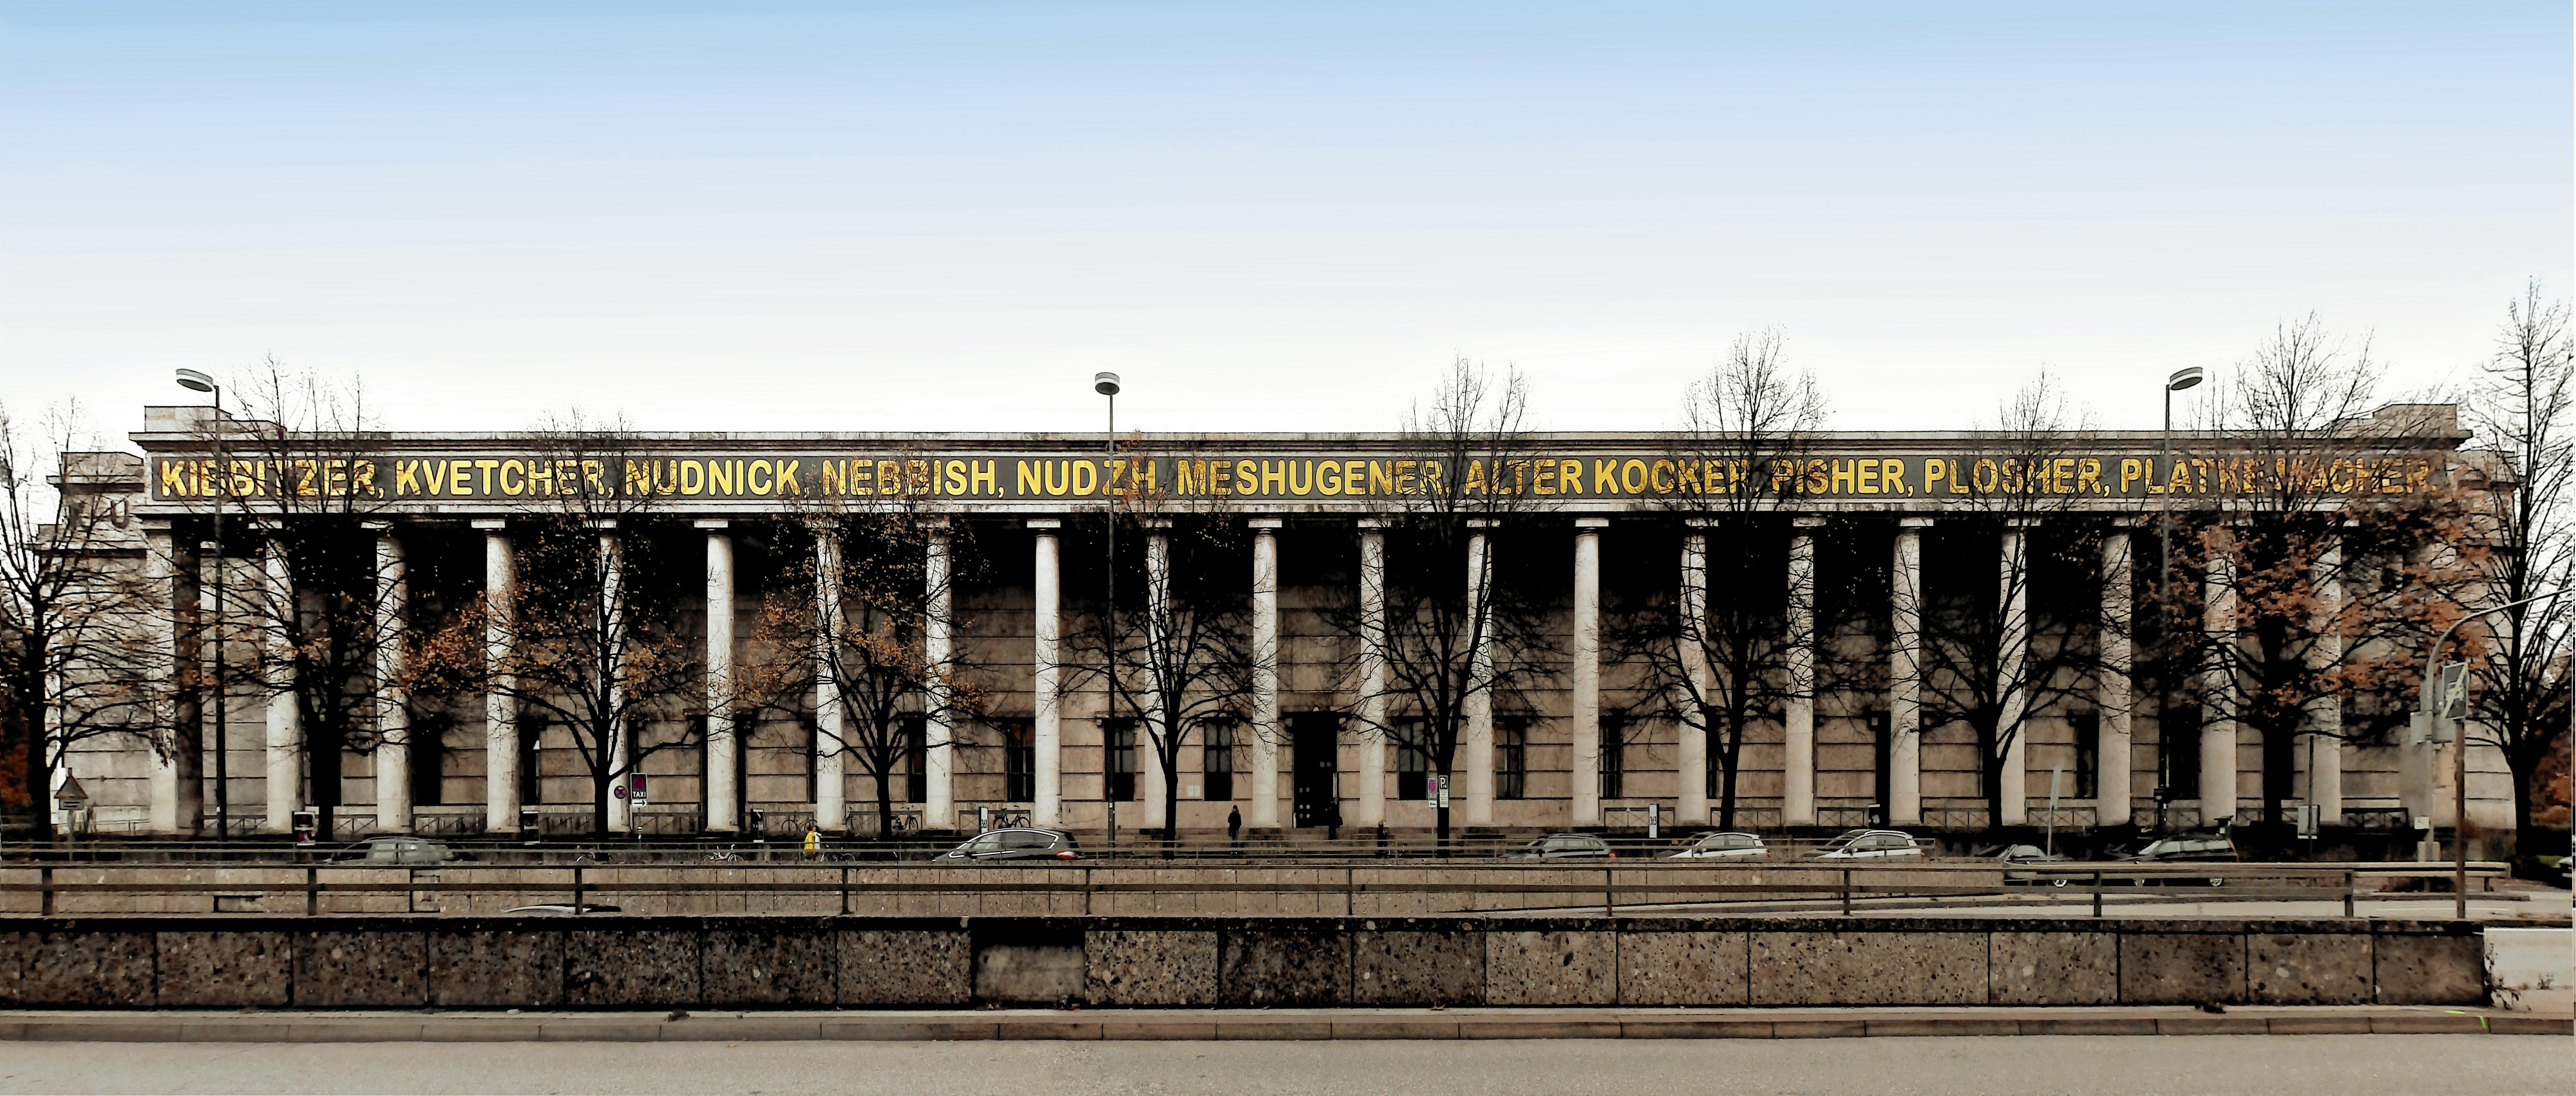 Haus der Kunst - Wikipedia size: 9247 x 3936 post ID: 1 File size: 0 B